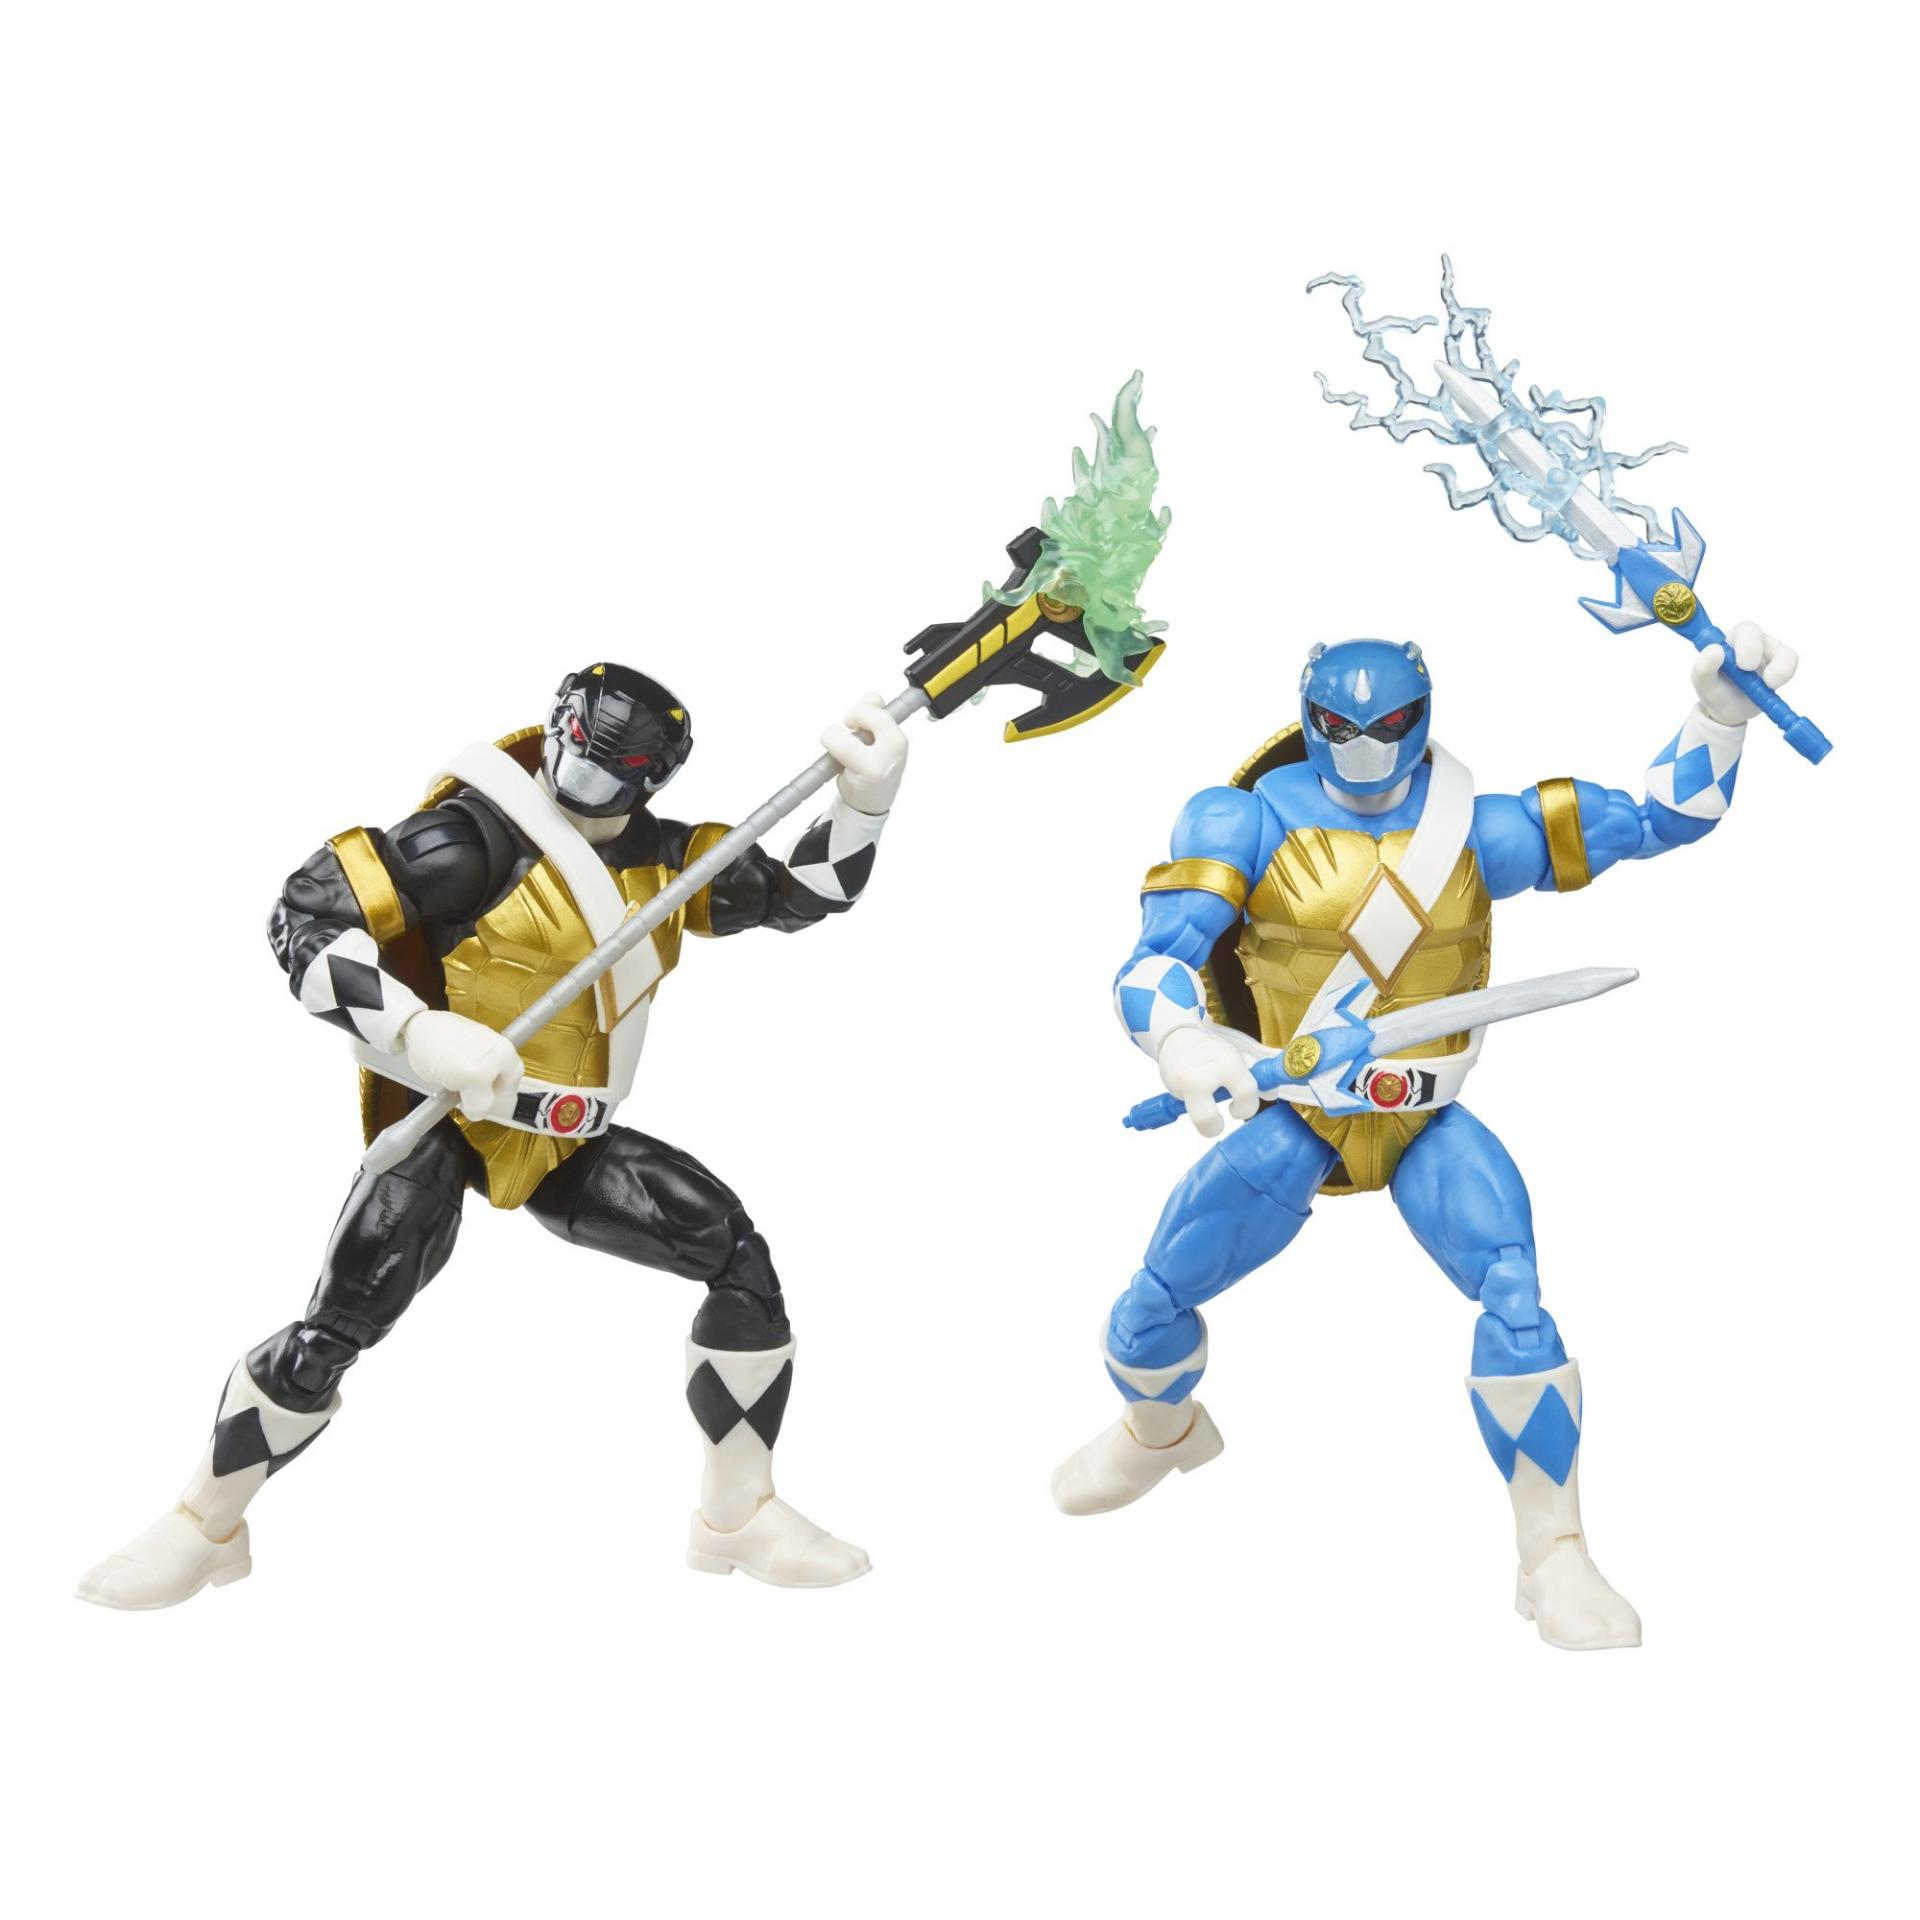 Power rangers tortue ninja tmnt lightning collection morphed donatello morphed leonardo 15cm4